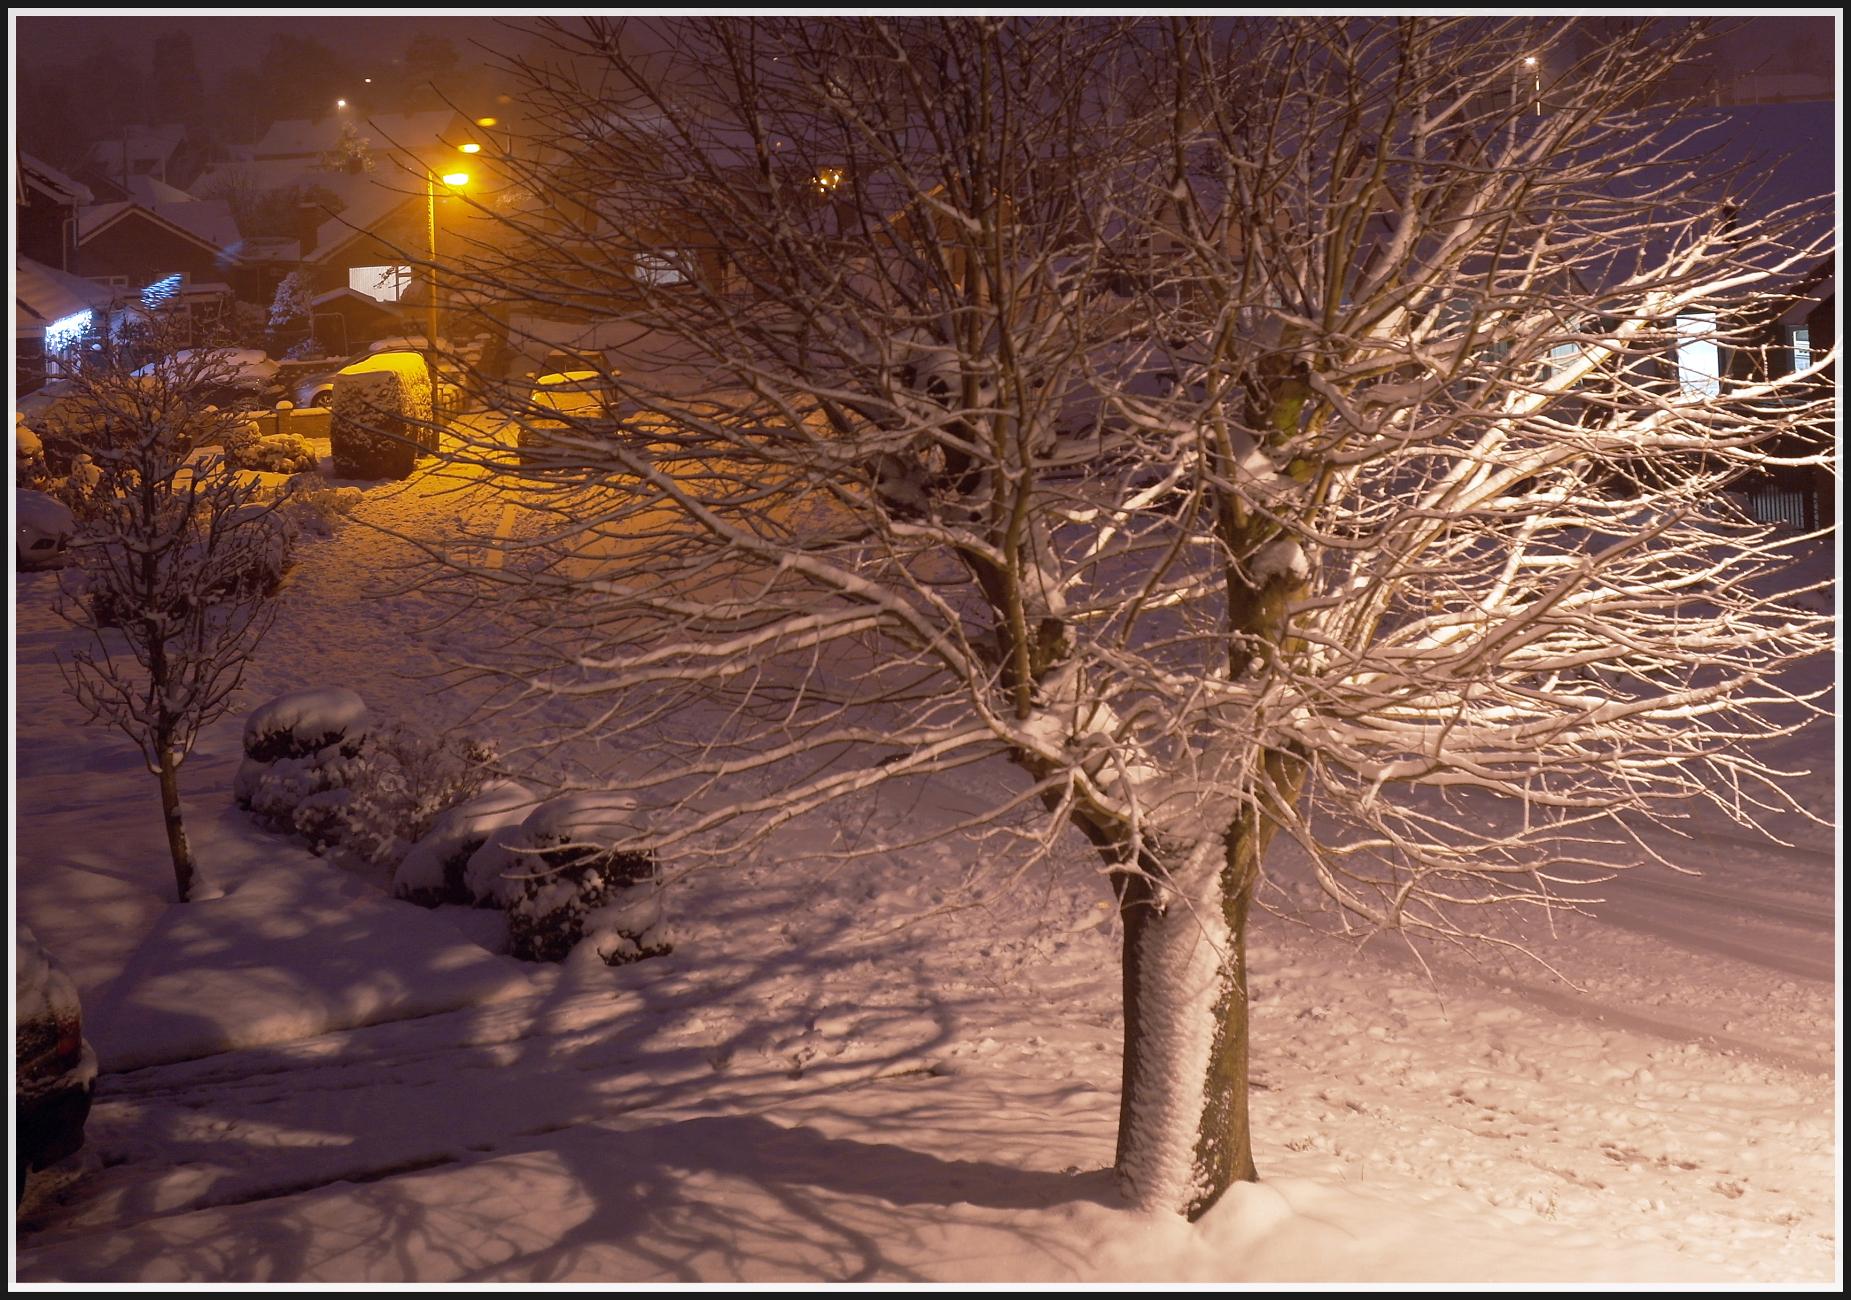 Shropshire Winter